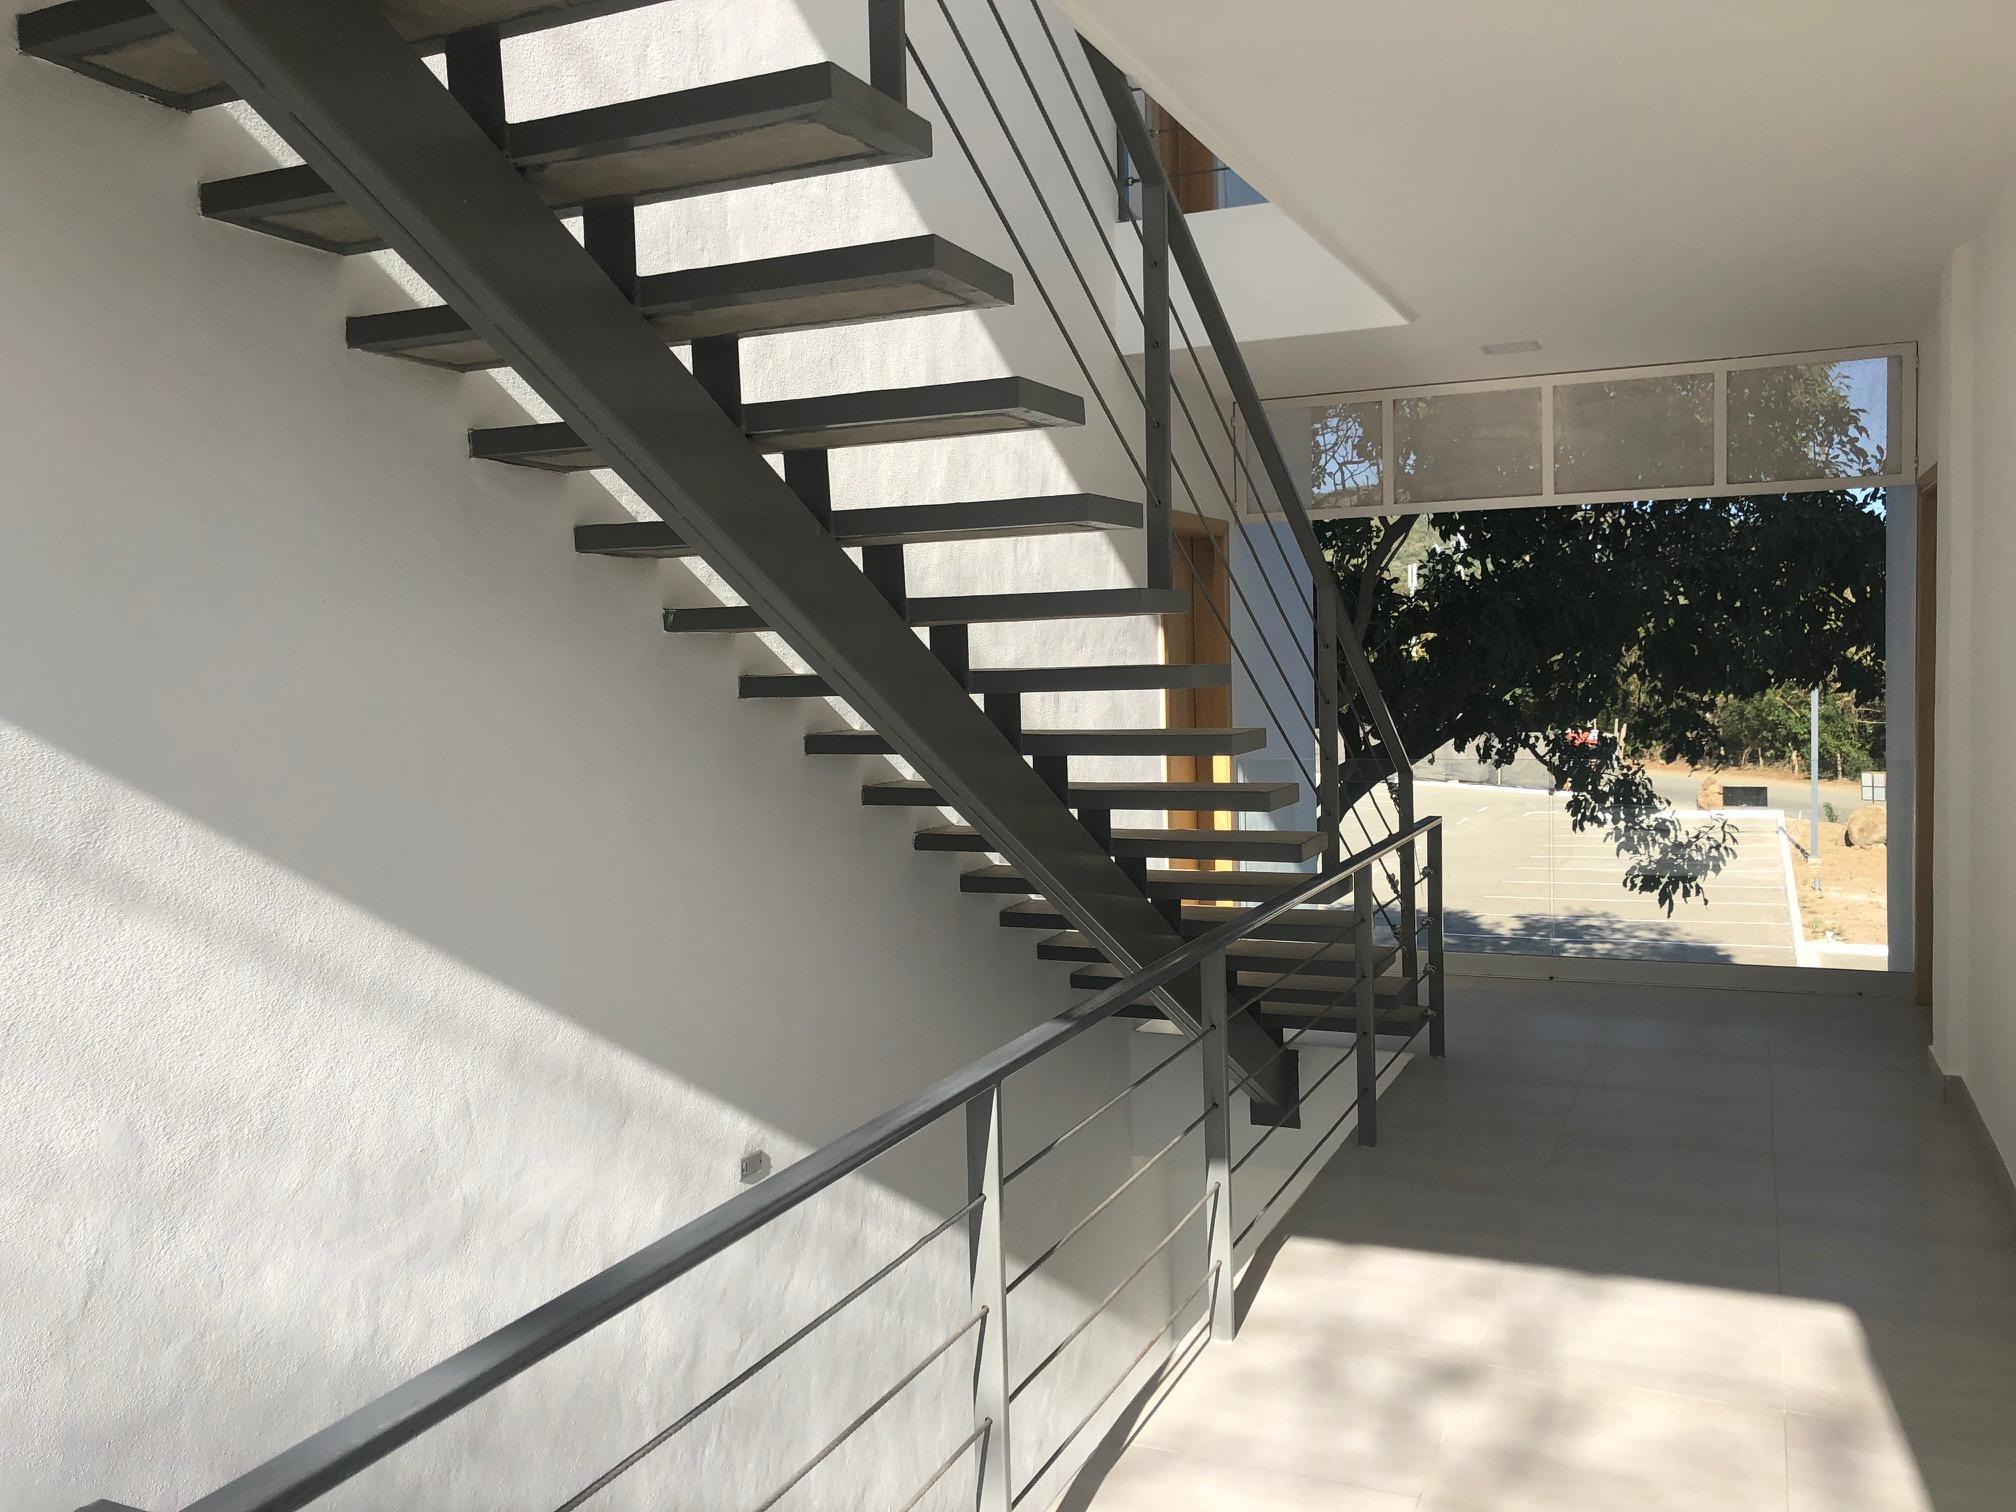 Real Estate For Nicaragua 15.jpg